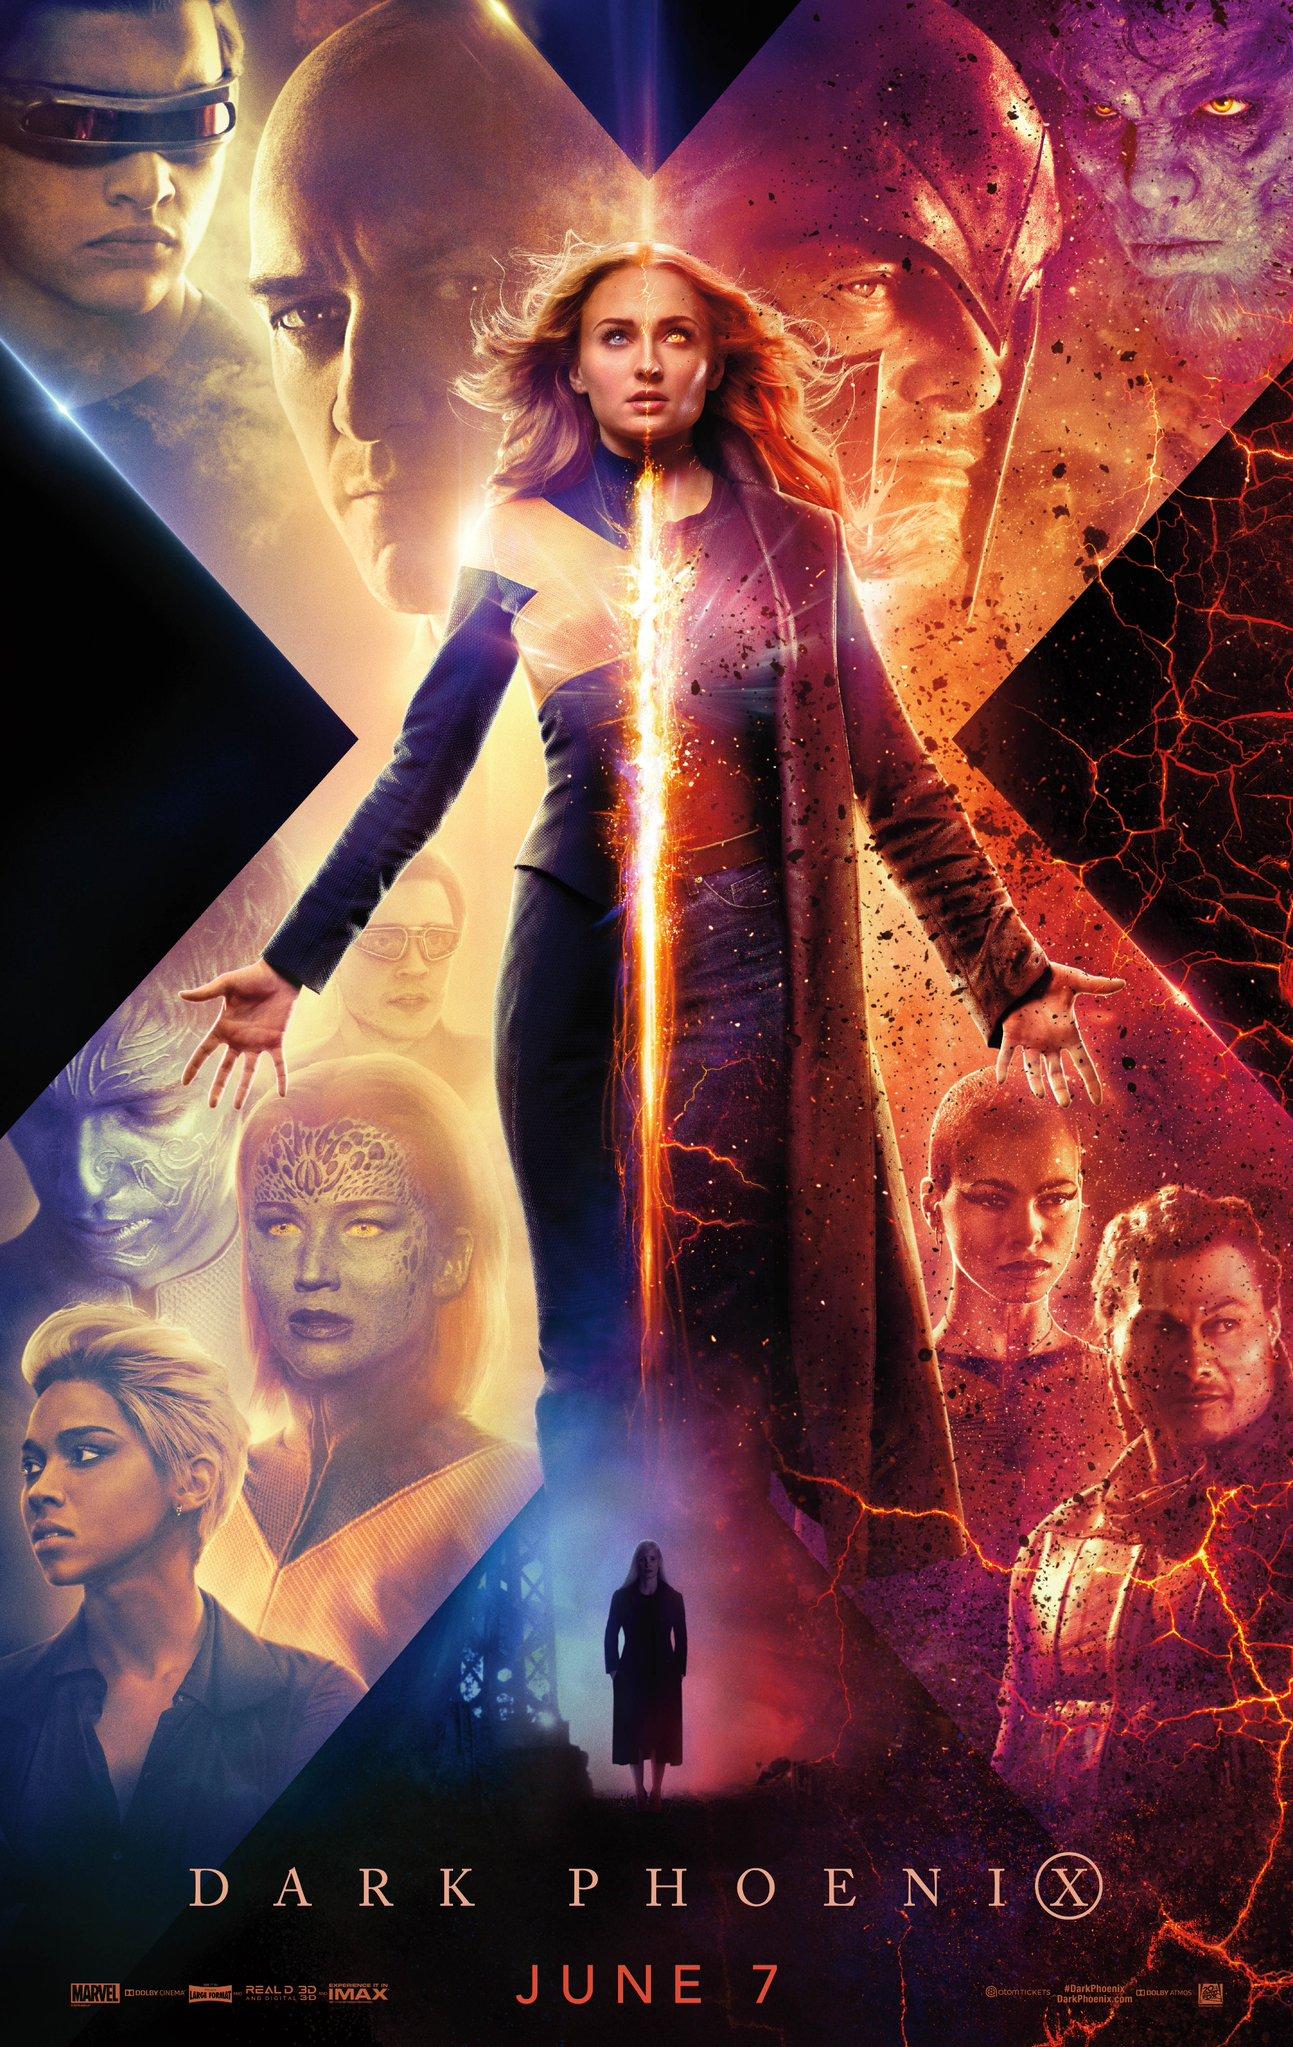 Will X-Men: Dark Phoenix be the last X-Men movie?